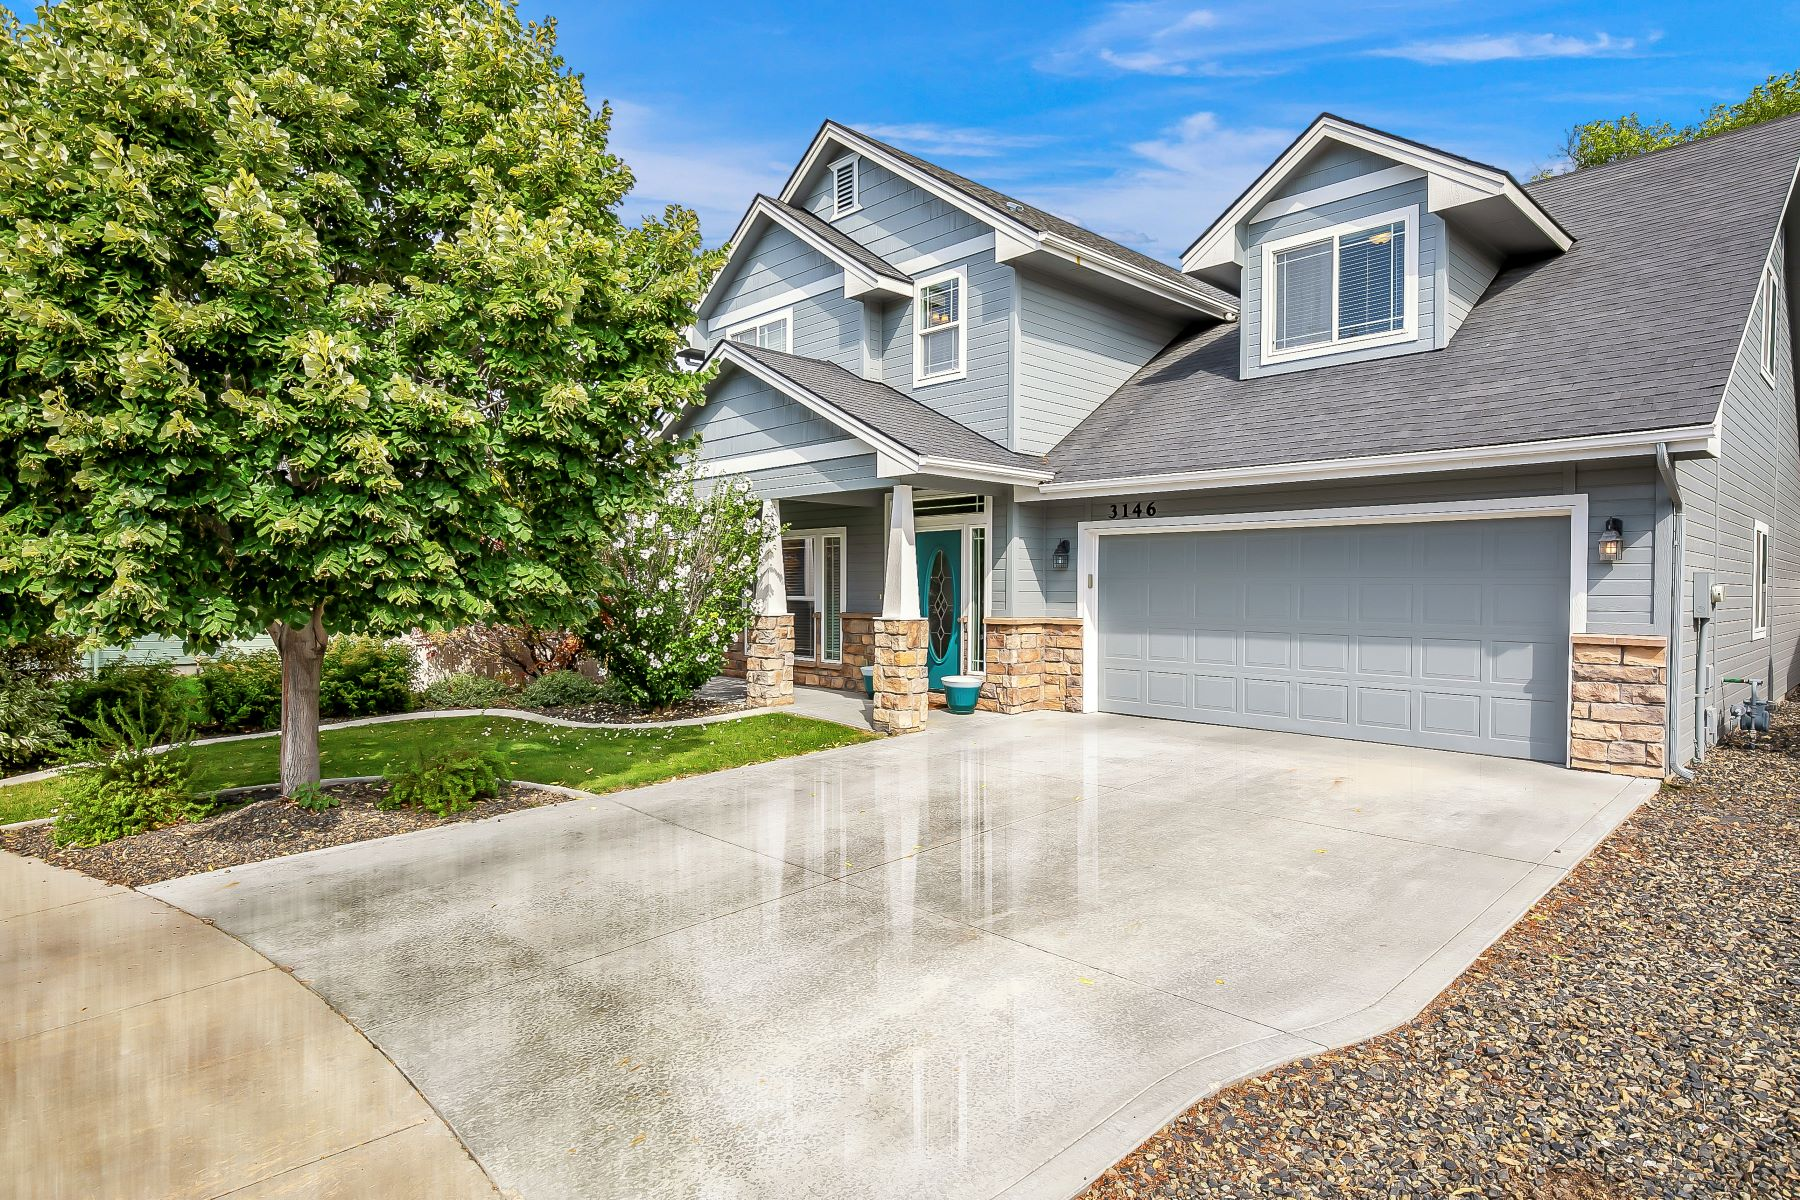 Single Family Homes pour l Vente à 3146 Savia Place, Meridian 3146 Savia Pl Meridian, Idaho 83616 États-Unis